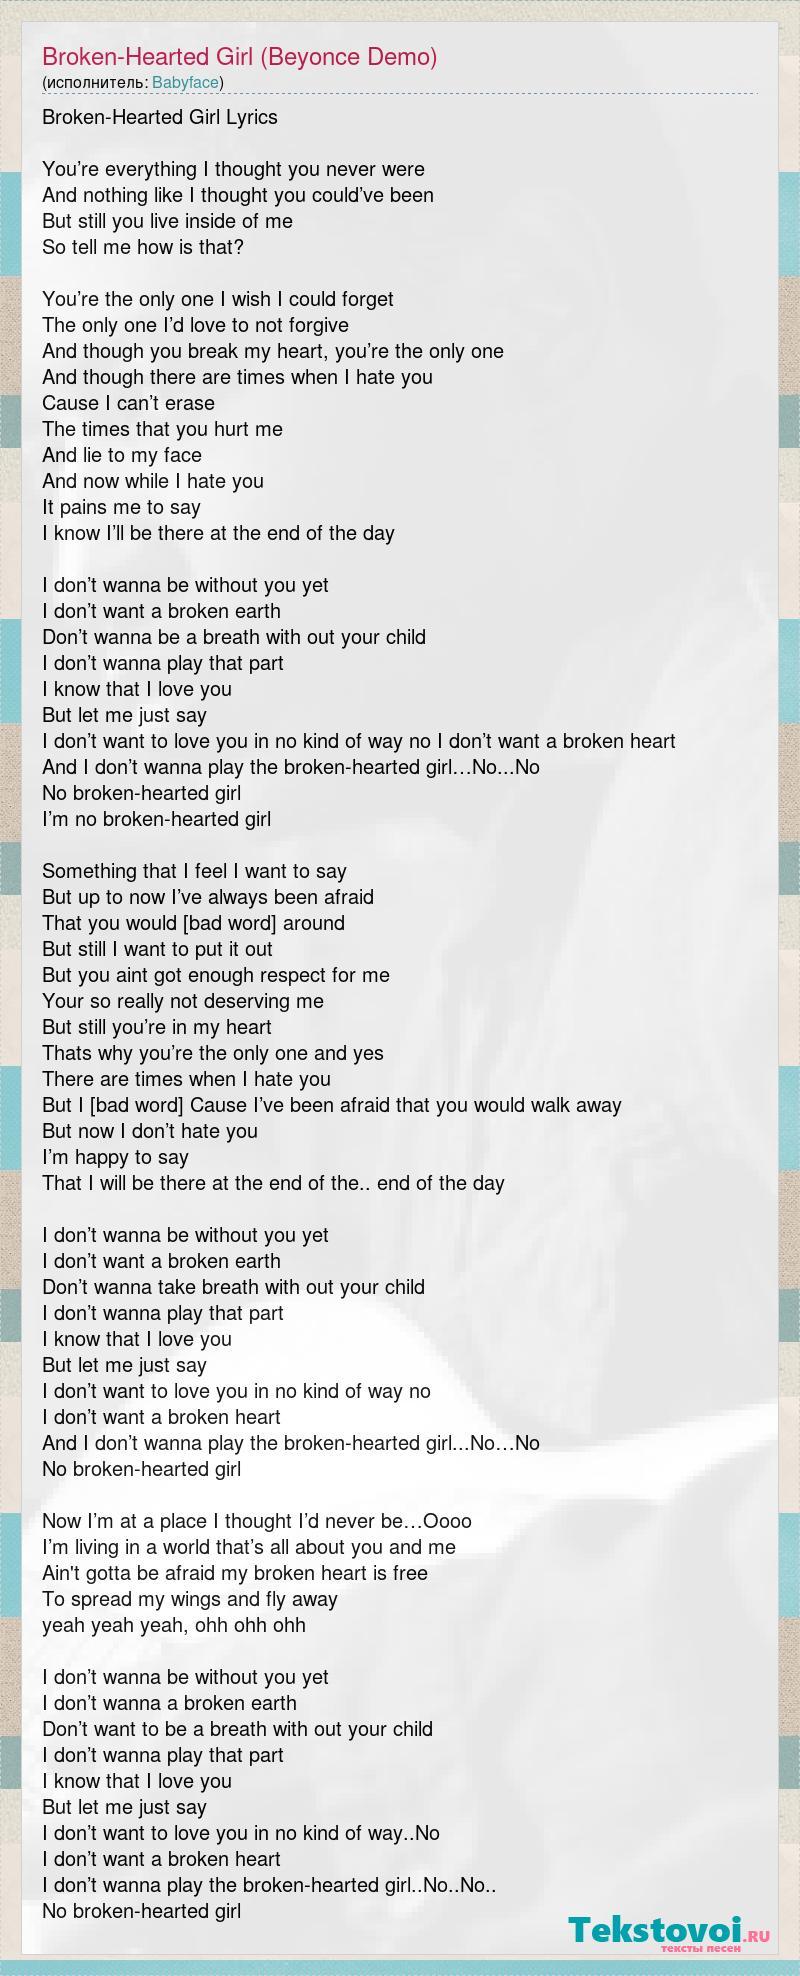 Babyface: Broken-Hearted Girl (Beyonce Demo) слова песни